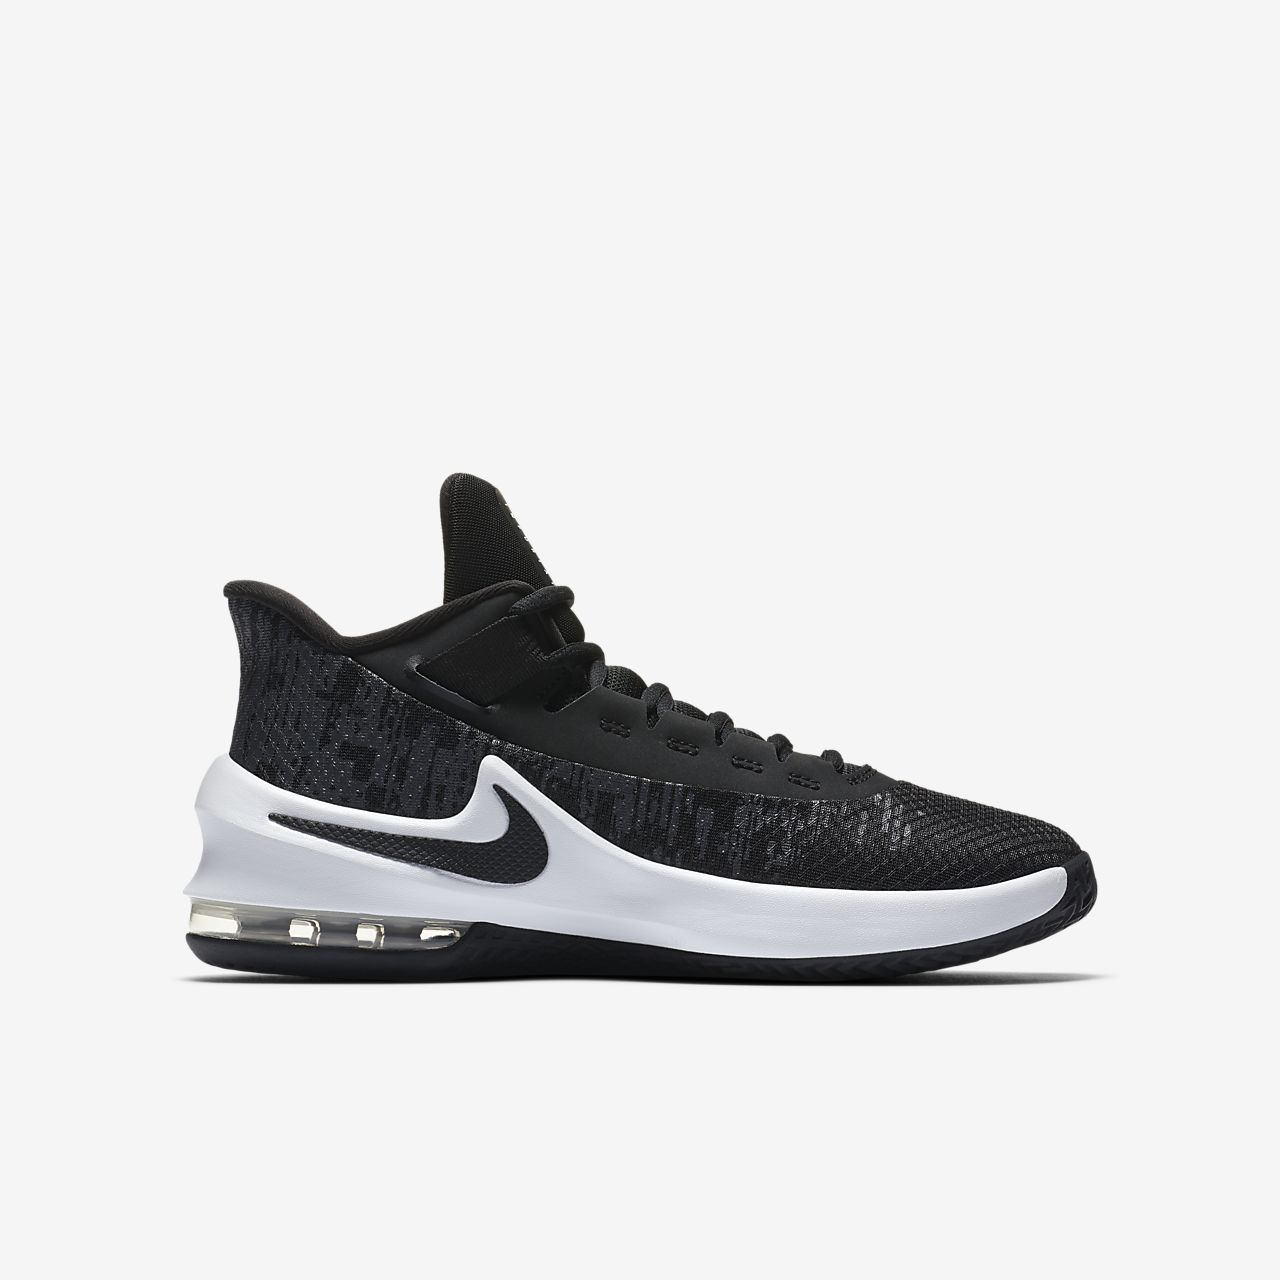 super popular 9145f fff52 ... Nike Air Max Infuriate II Mid Zapatillas de baloncesto - Niño a y niño a